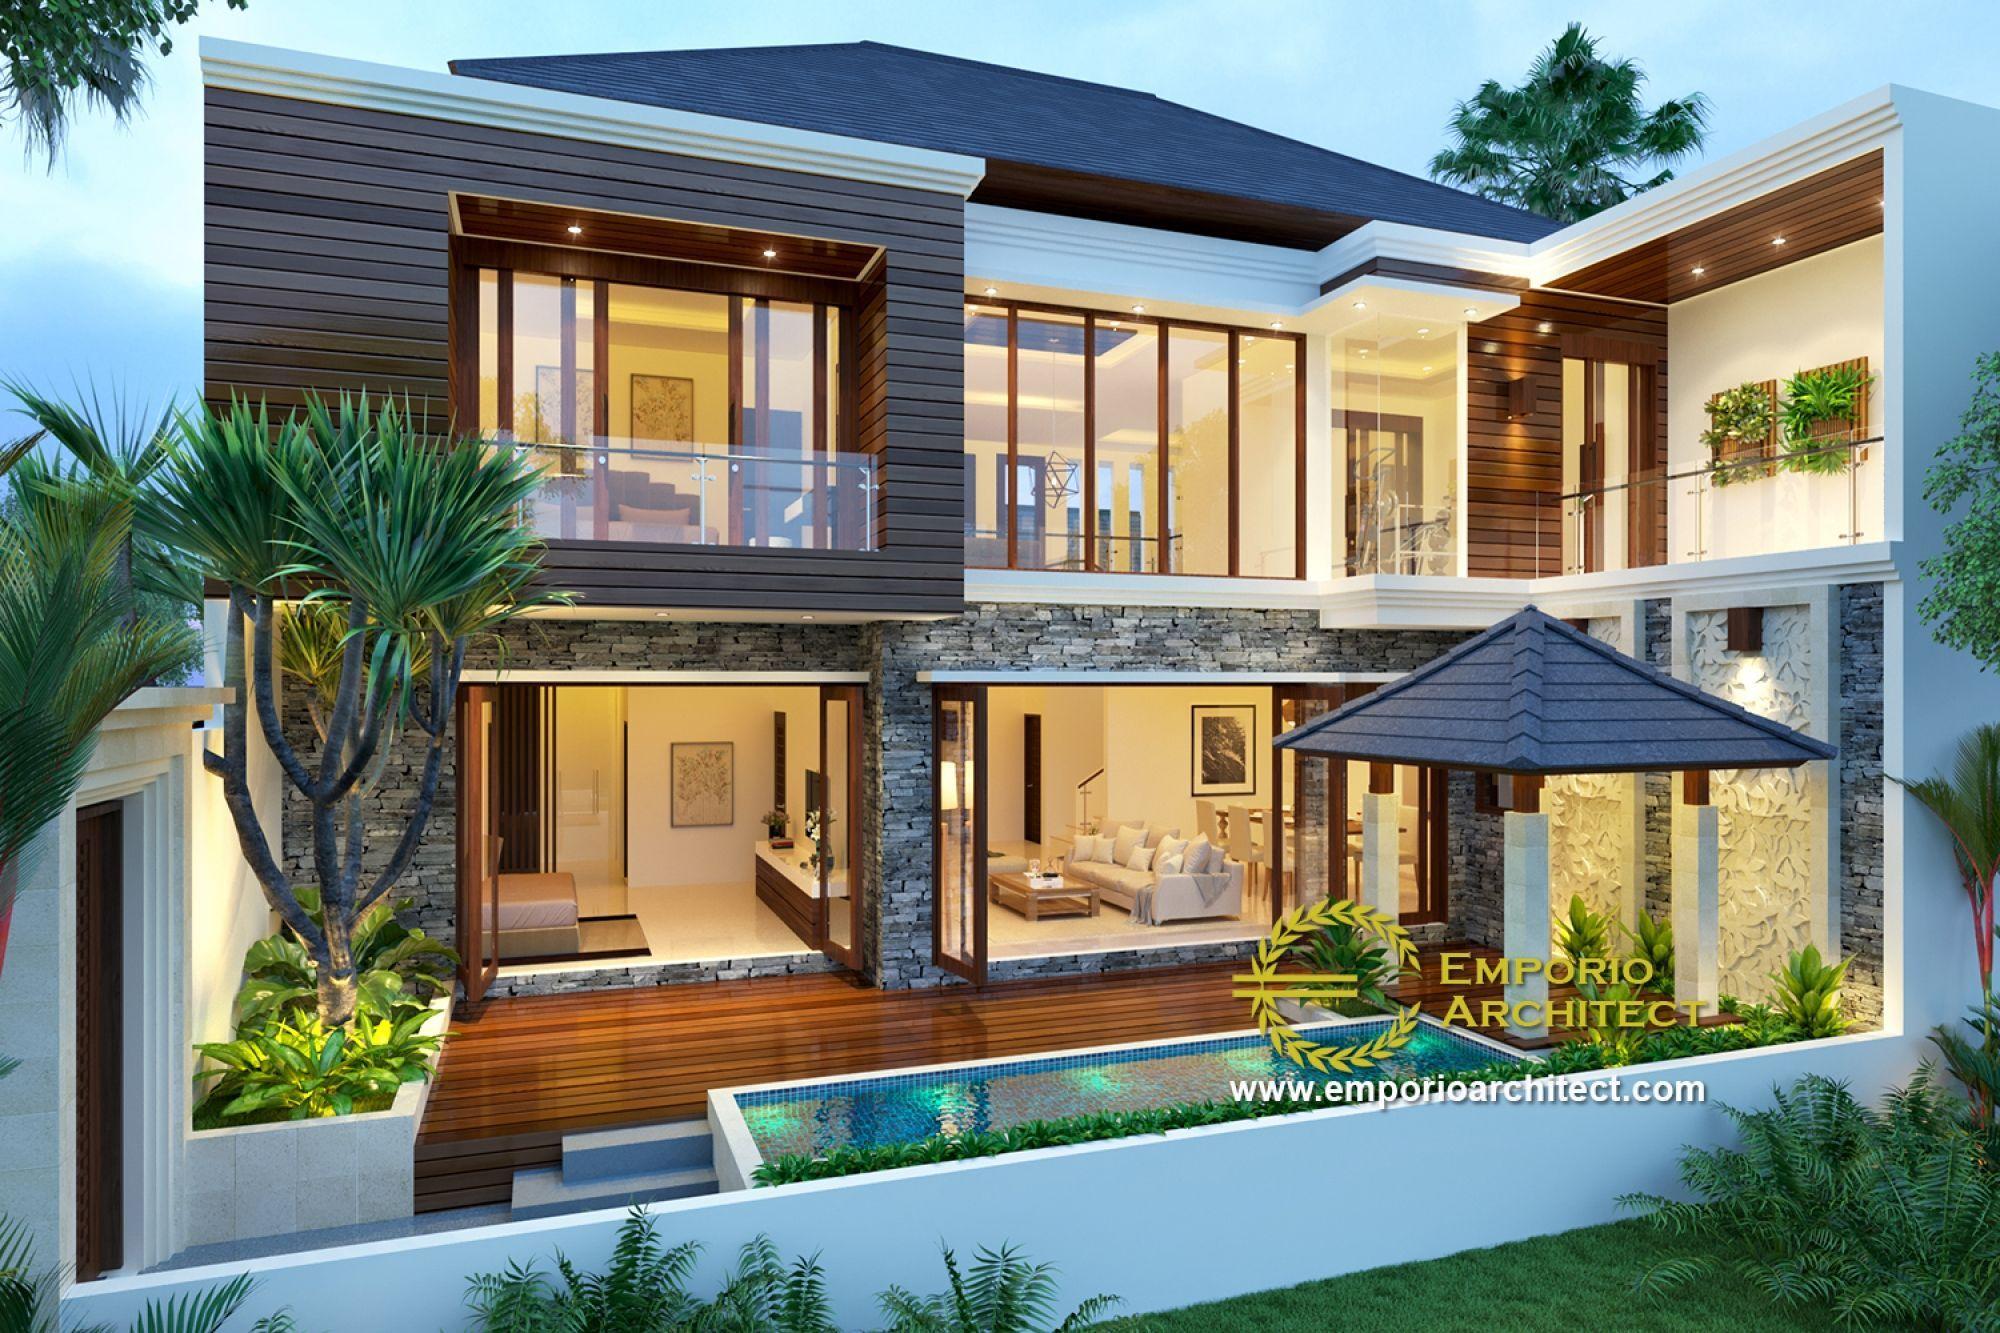 11 Savory Minimalist Decor Interior Design Ideas บ านในฝ น แบบบ านโมเด ร น บ าน